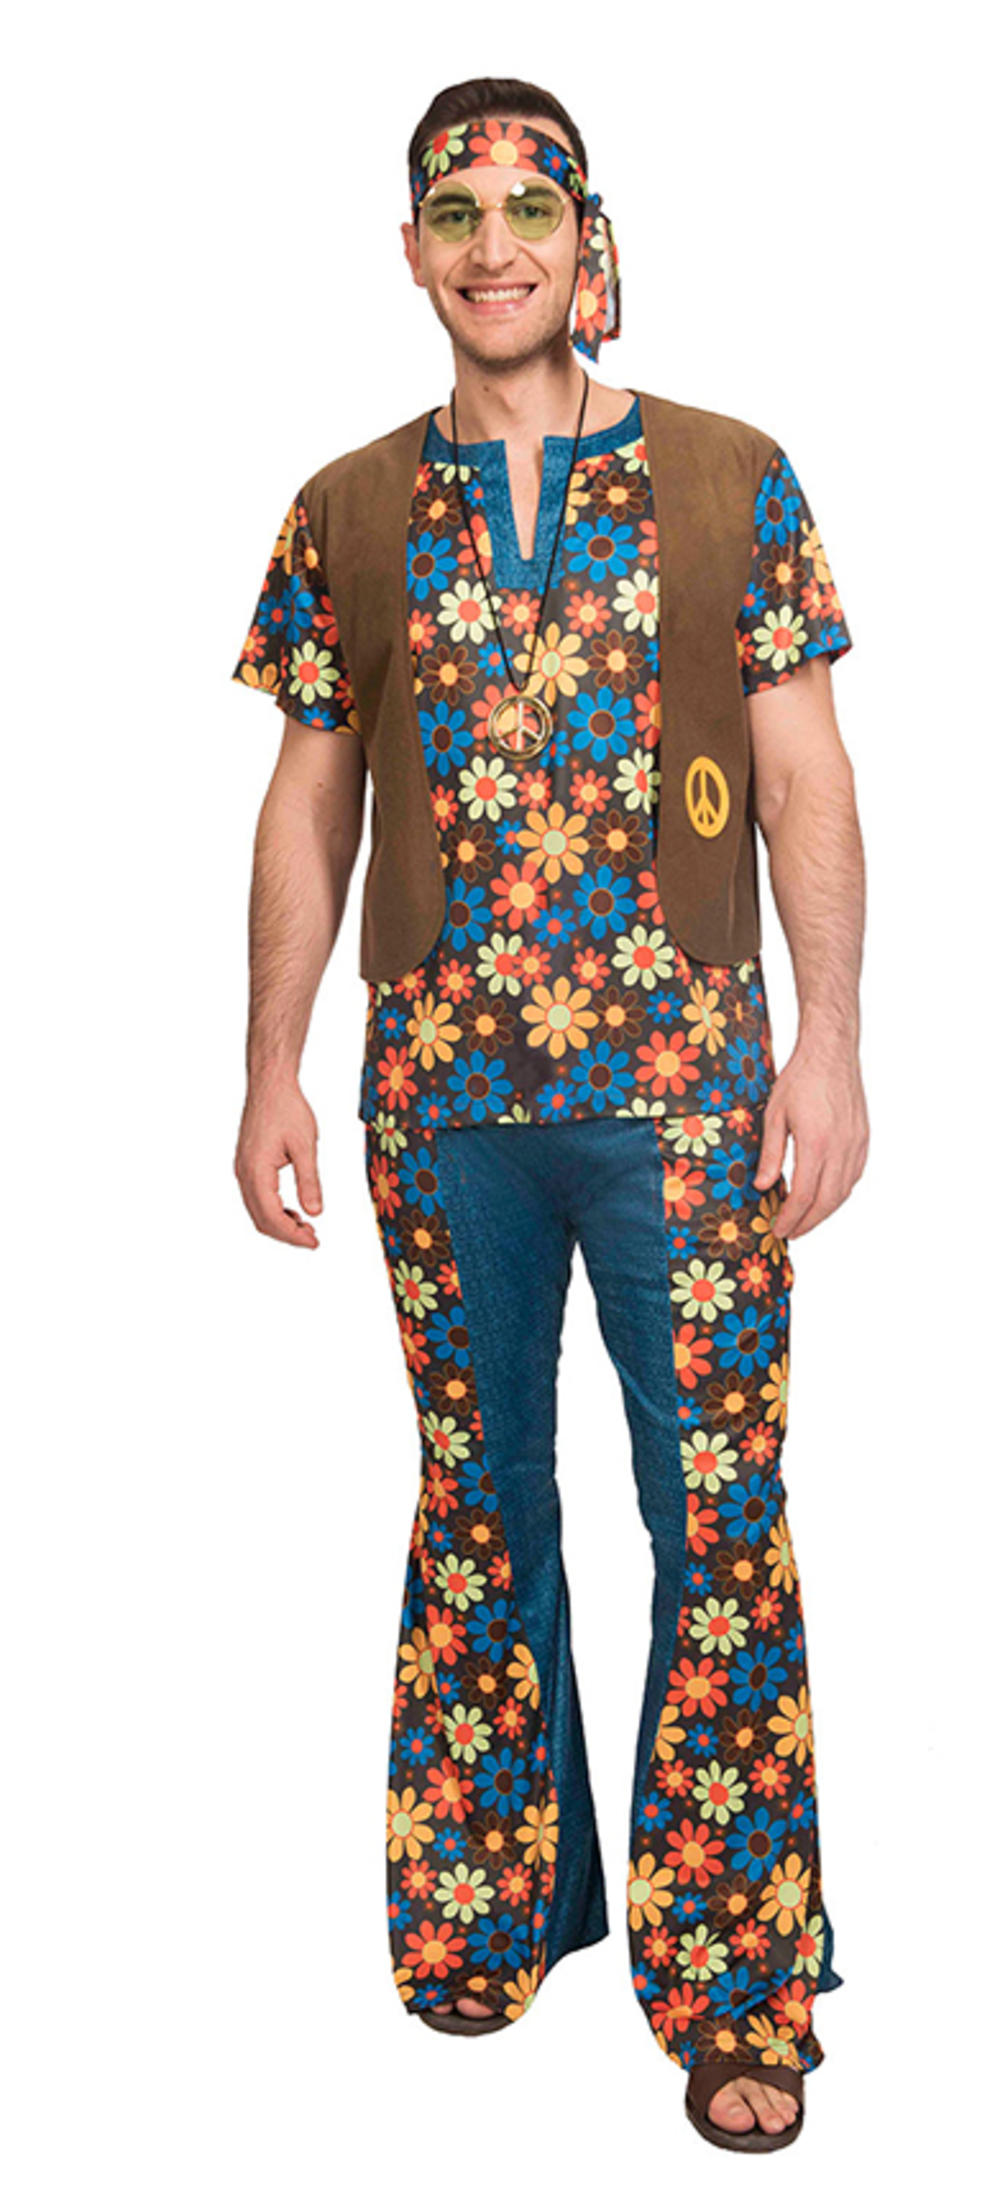 60s Groovy Hippie Man Costume